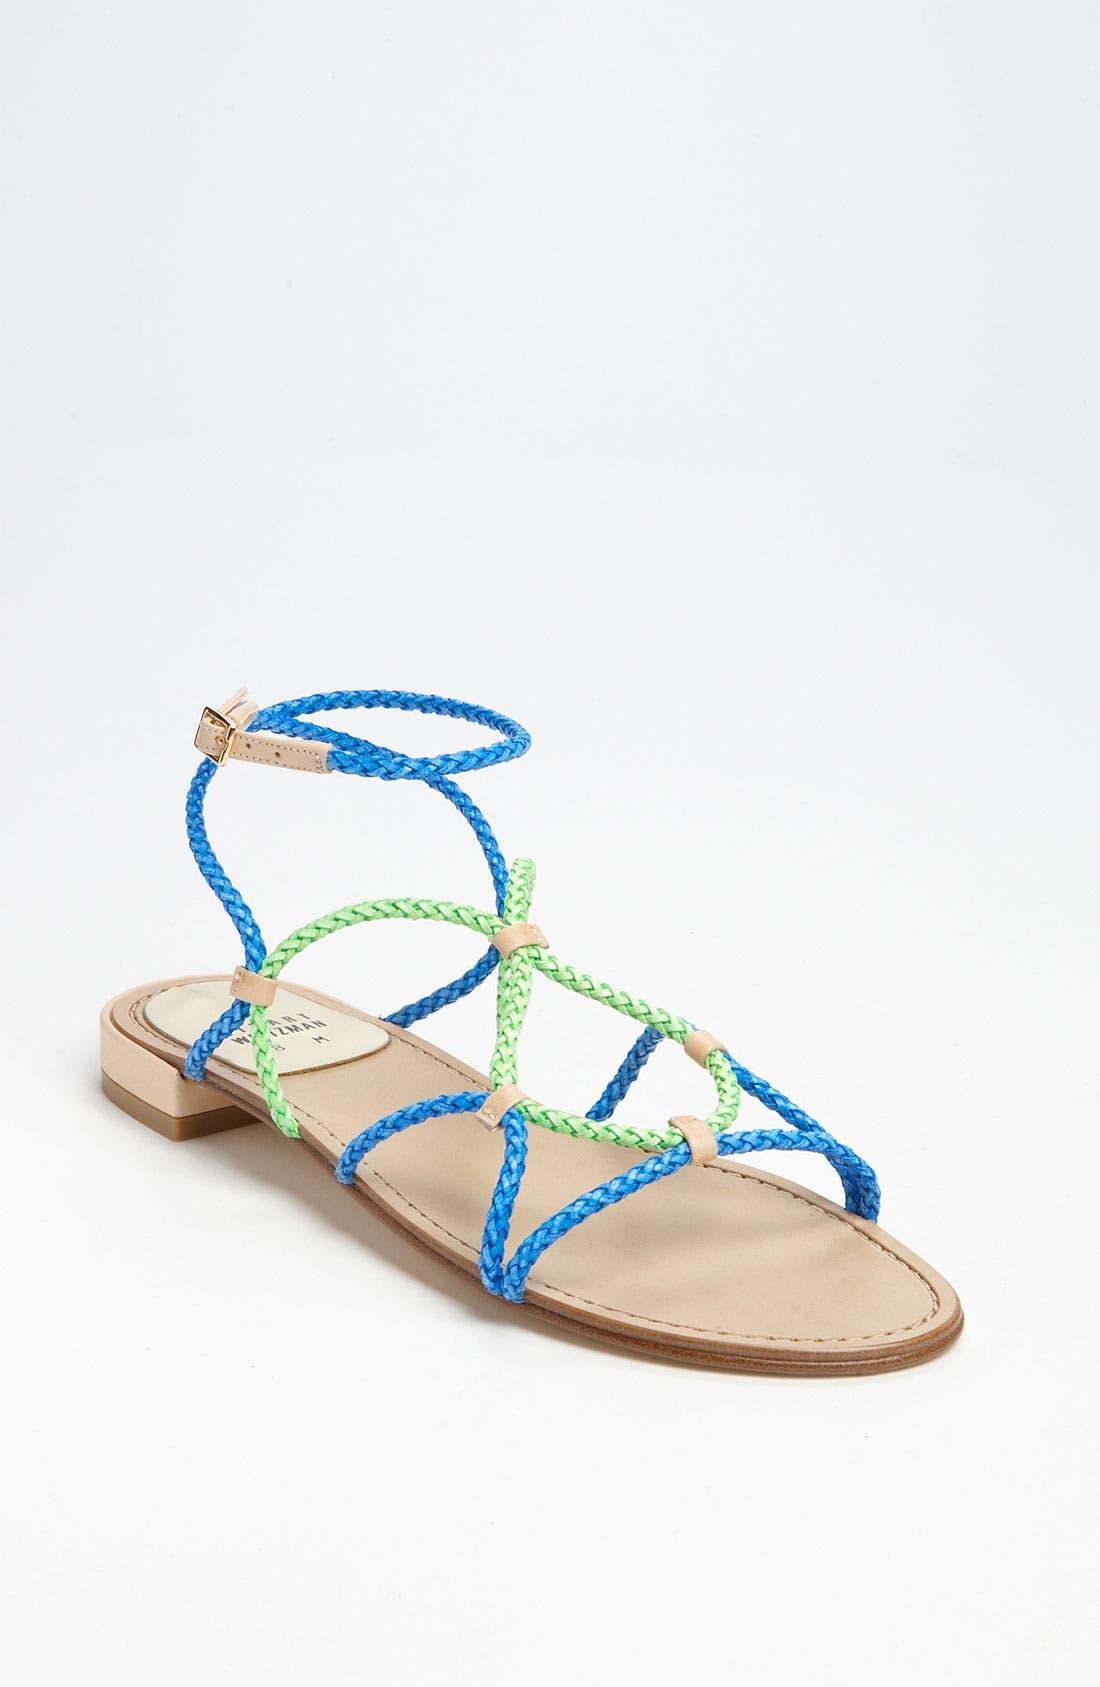 Main Image - Stuart Weitzman 'Cordy' Sandal